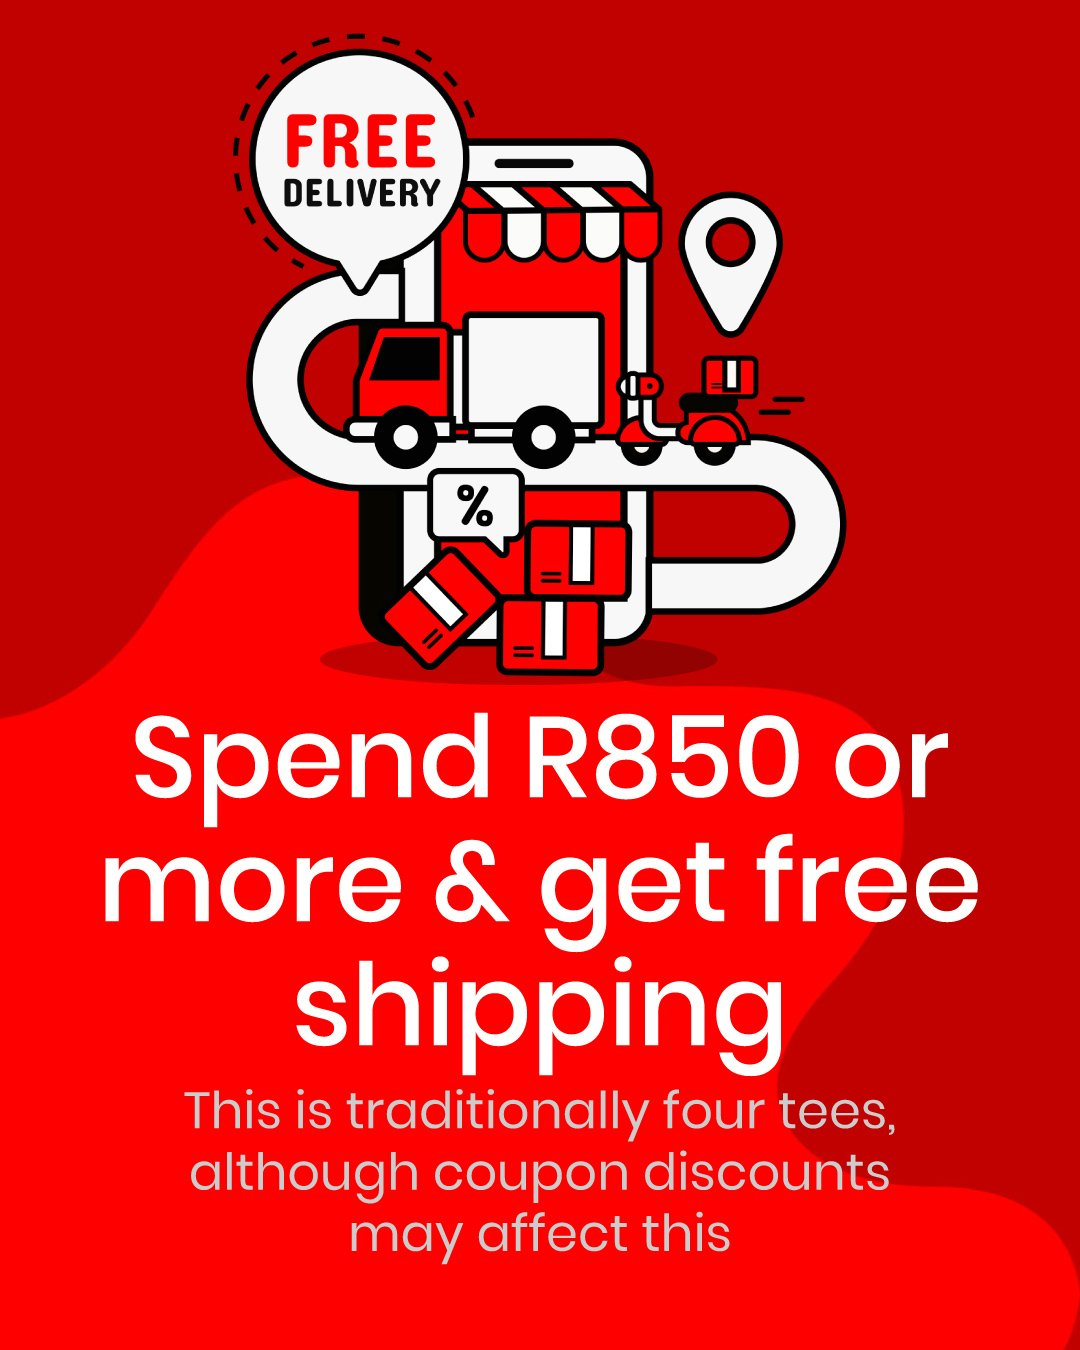 Free Shipping T-shirt Banner